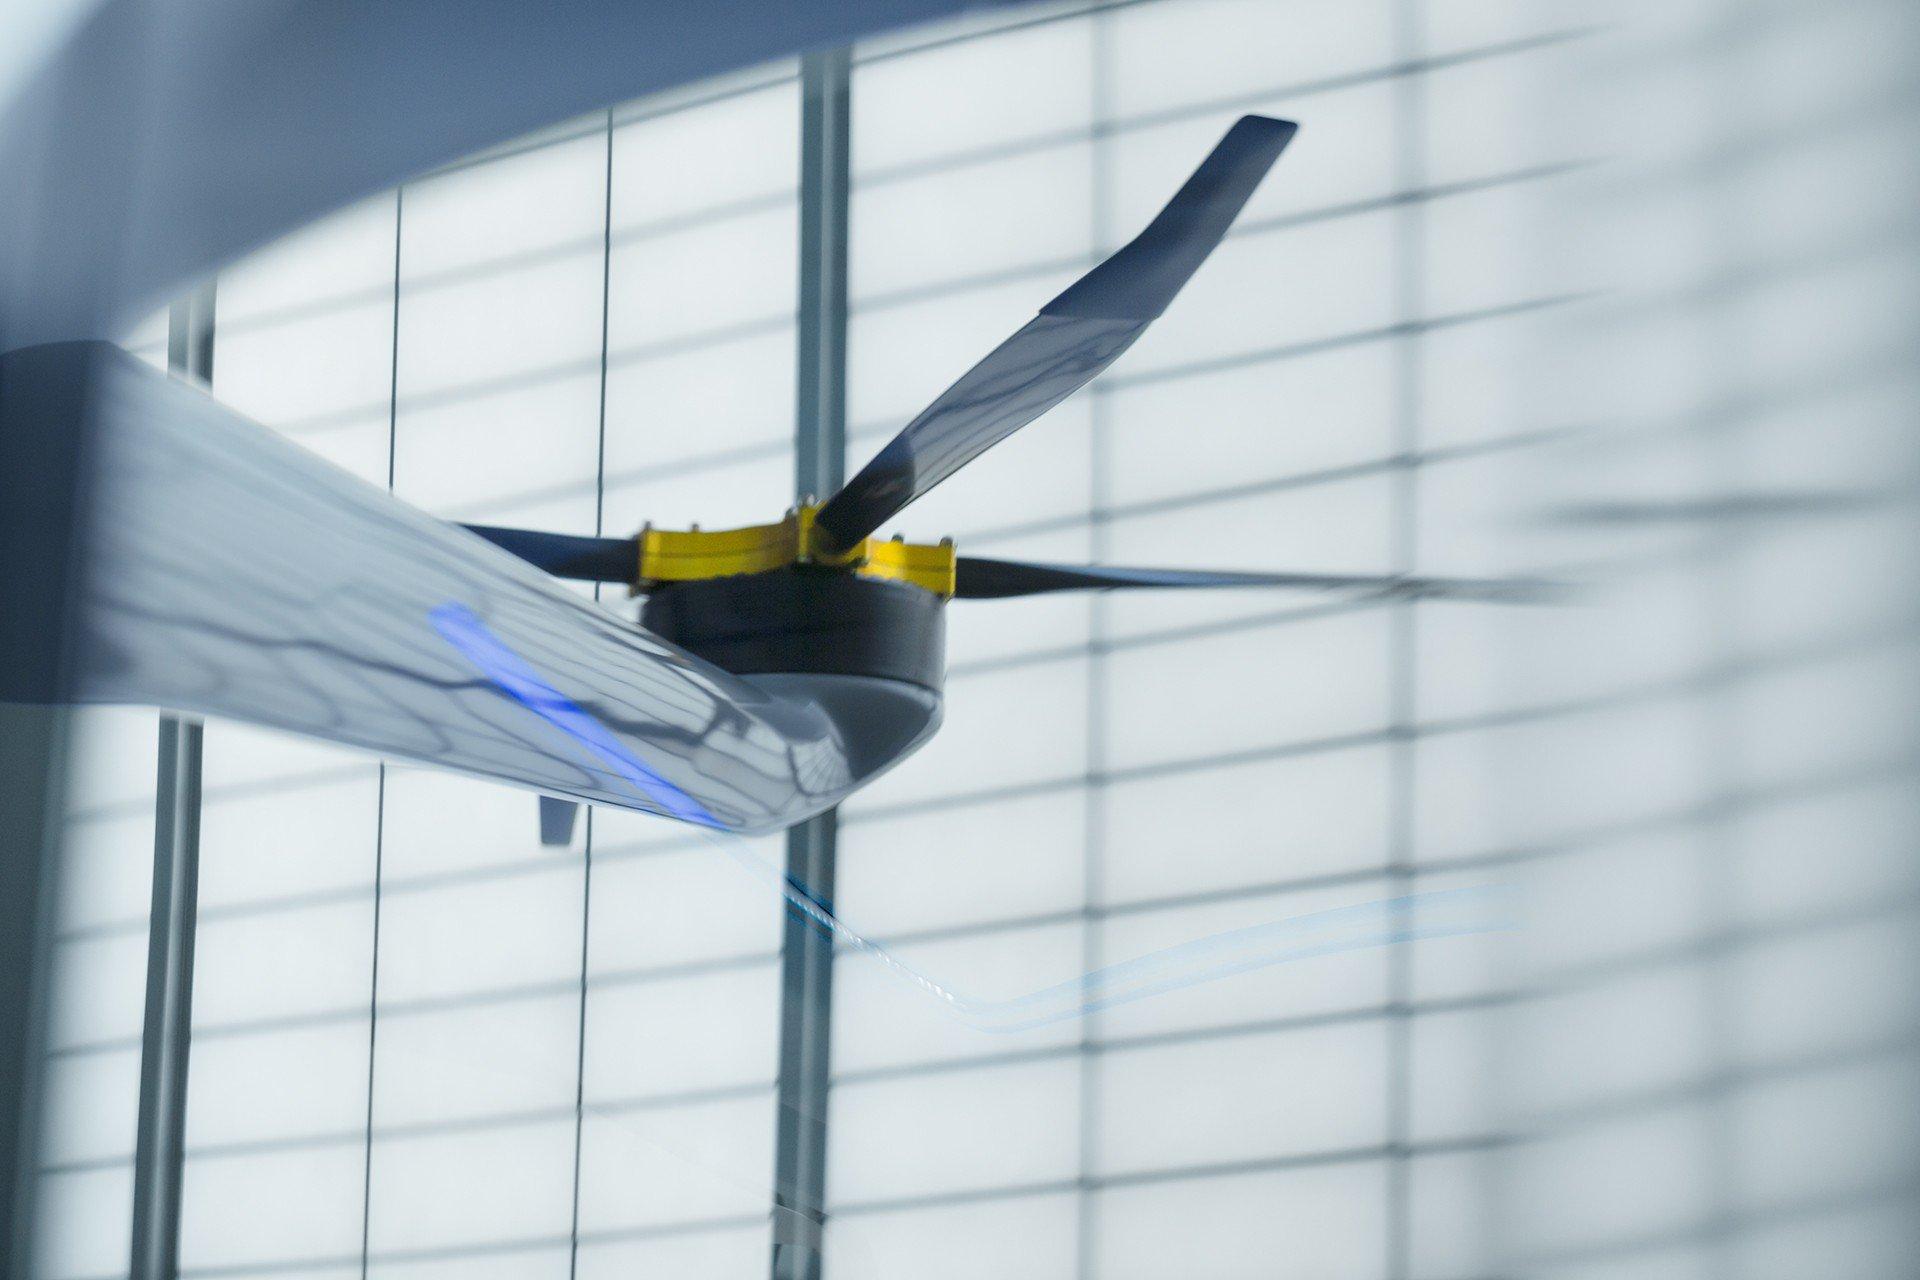 Alakai-Technologies-Skai-flying-car-6